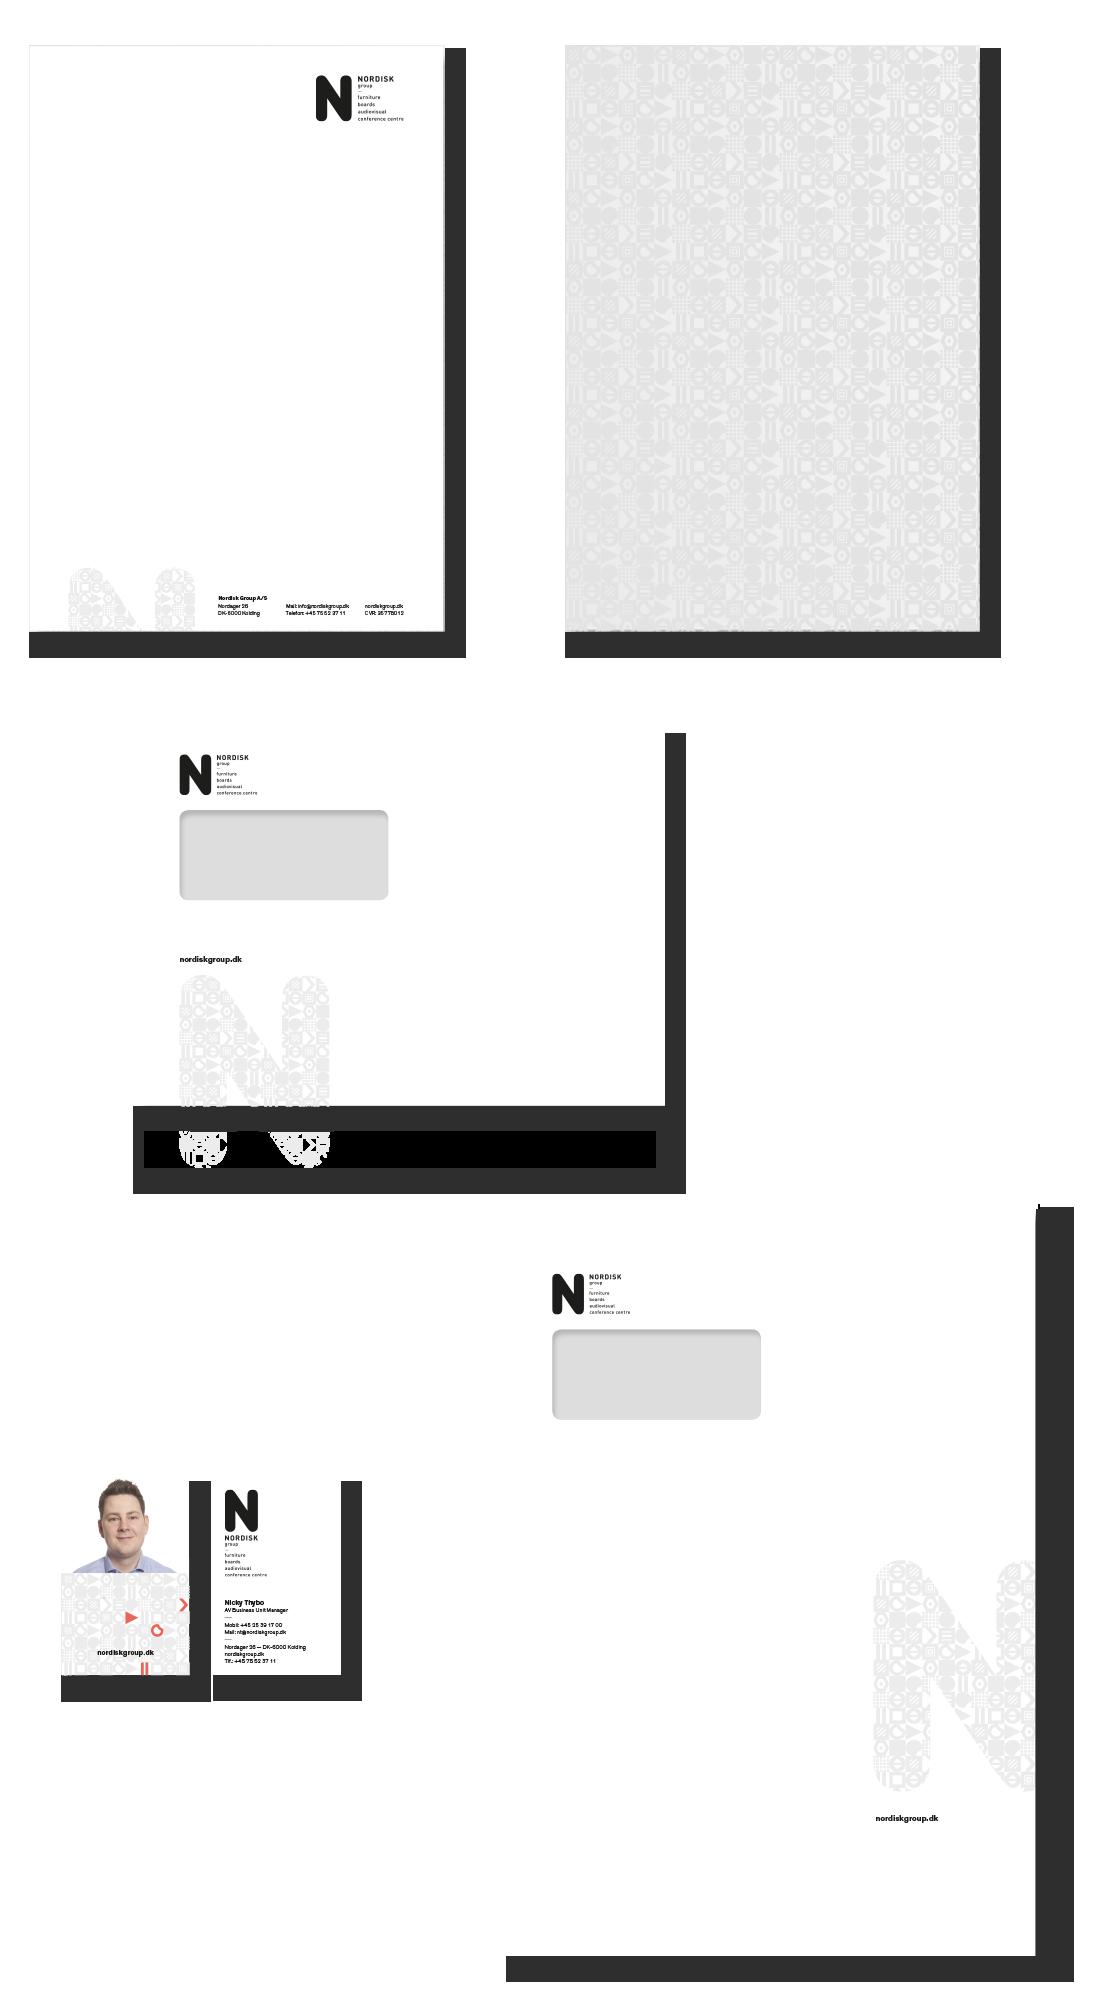 Nordisk-visuel-identitet_brevpapir_03